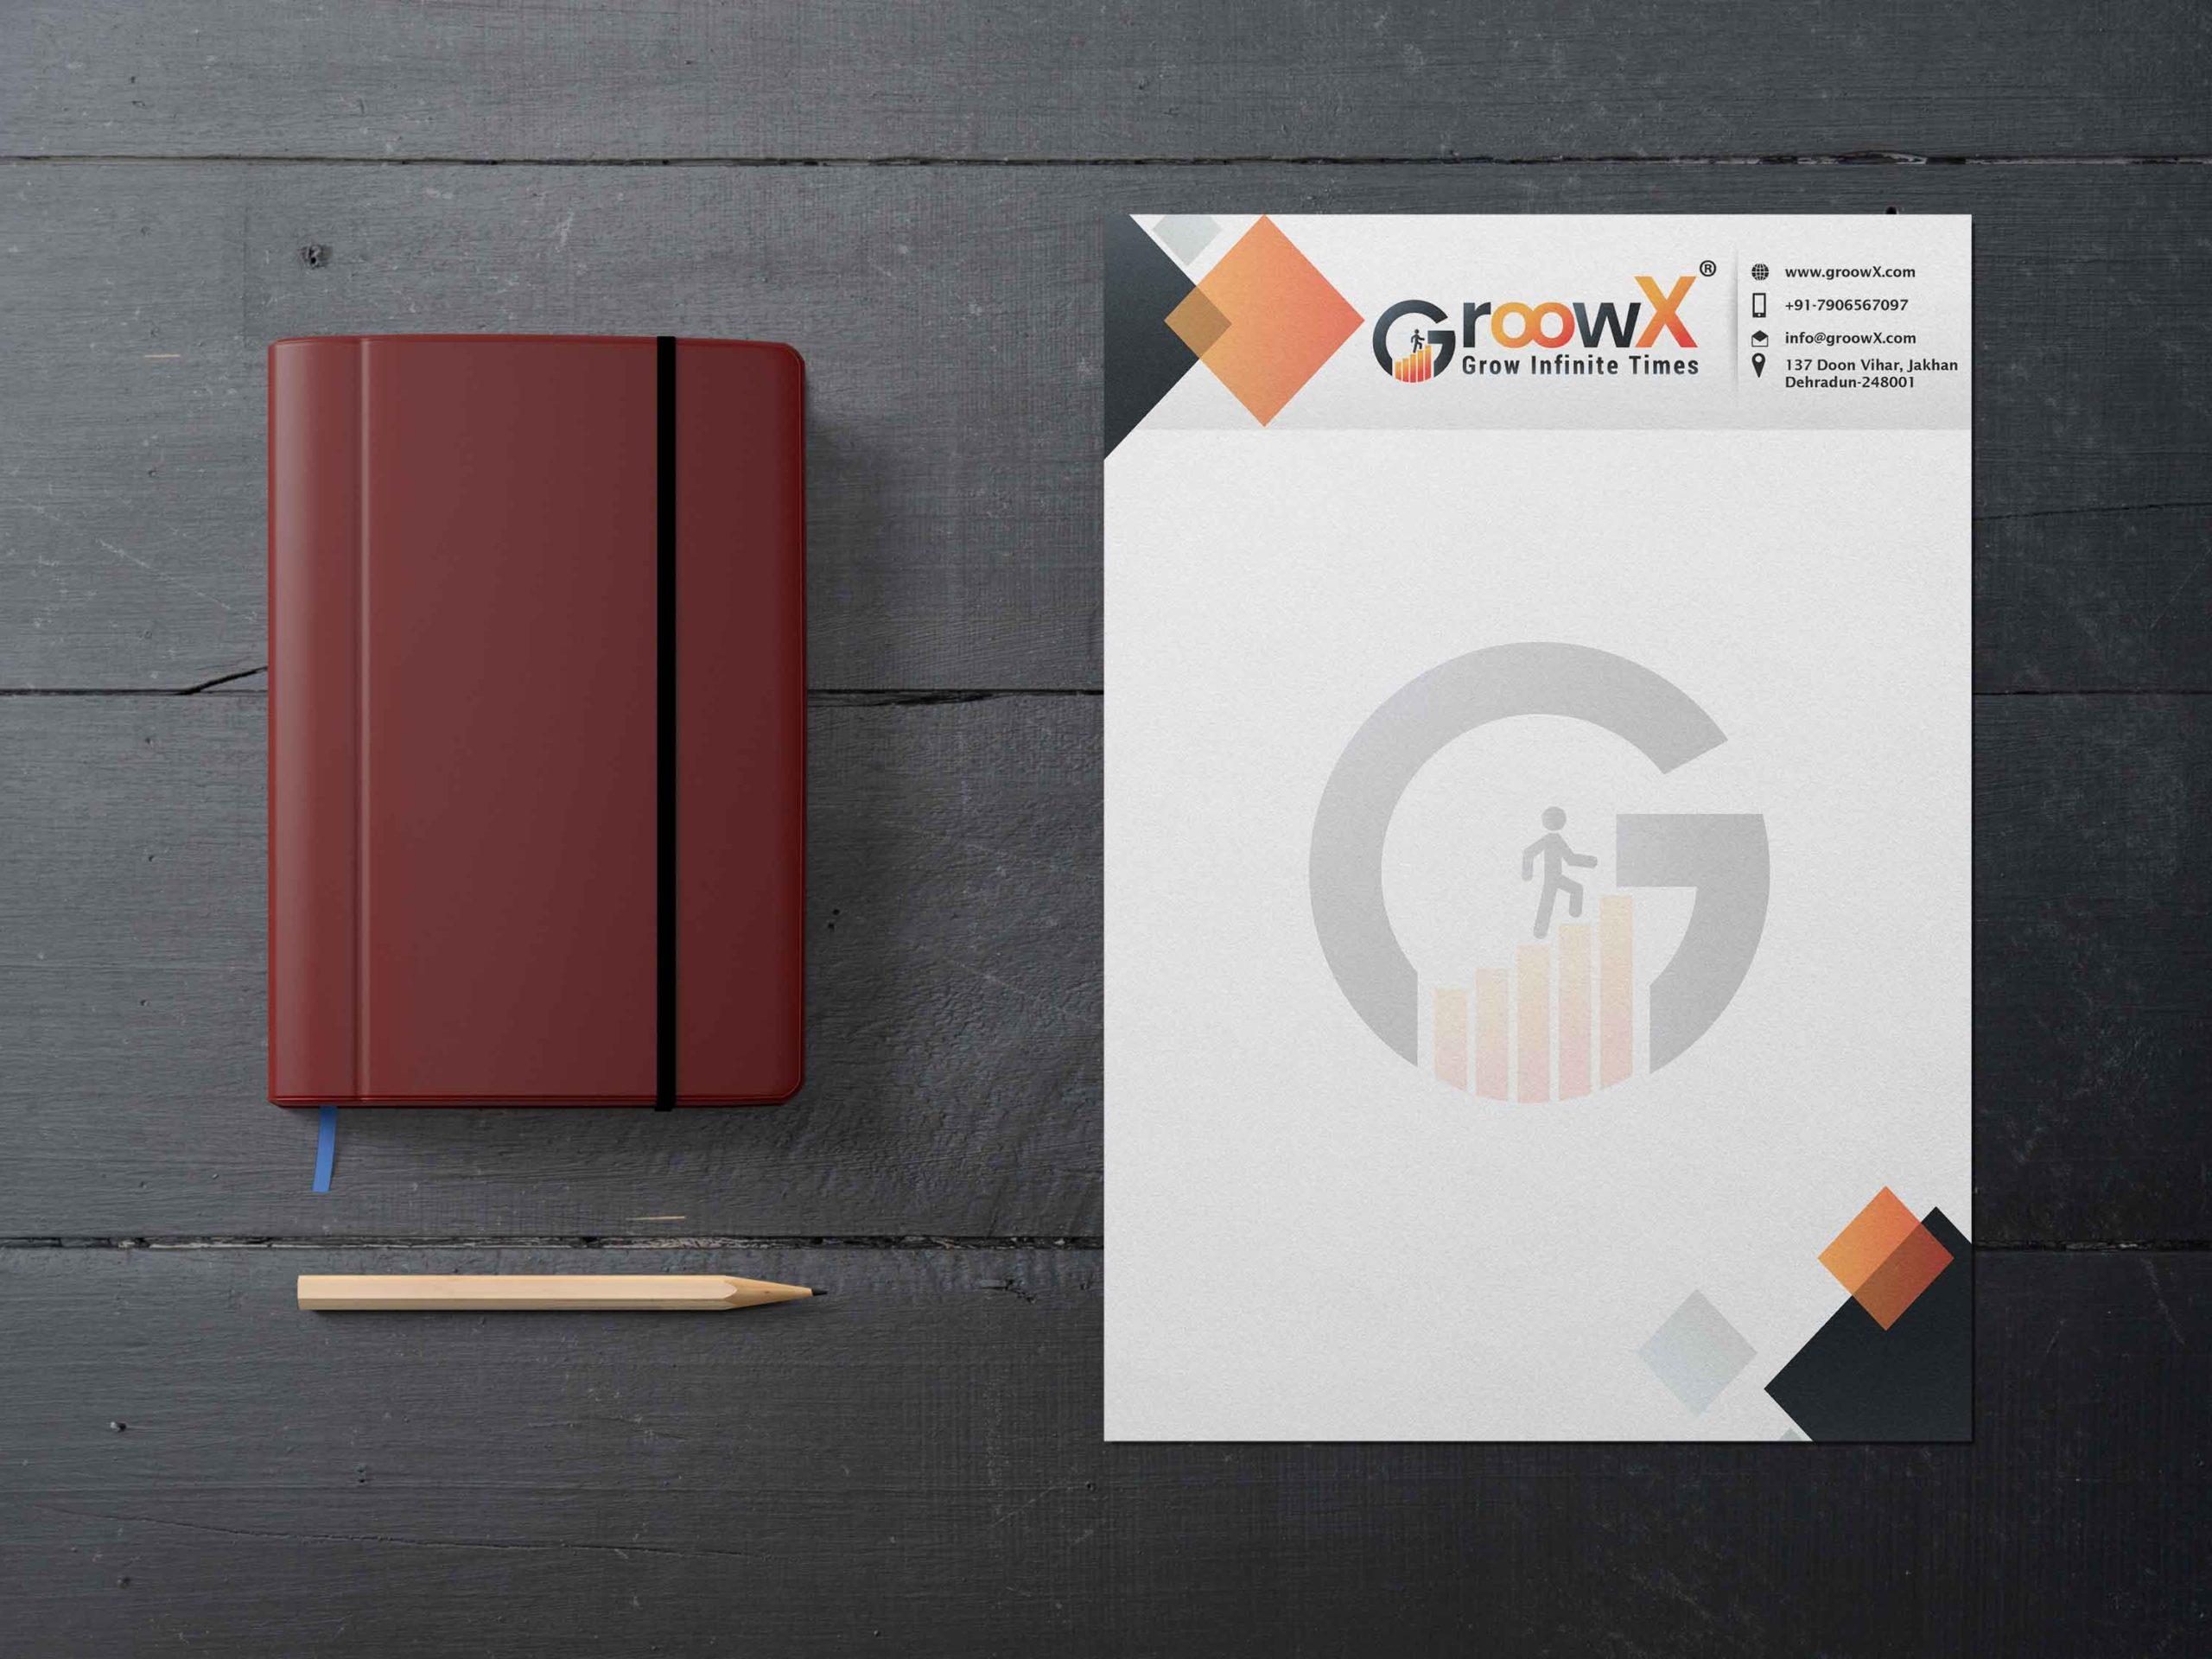 groowx company corporate letterhead design by Badri design